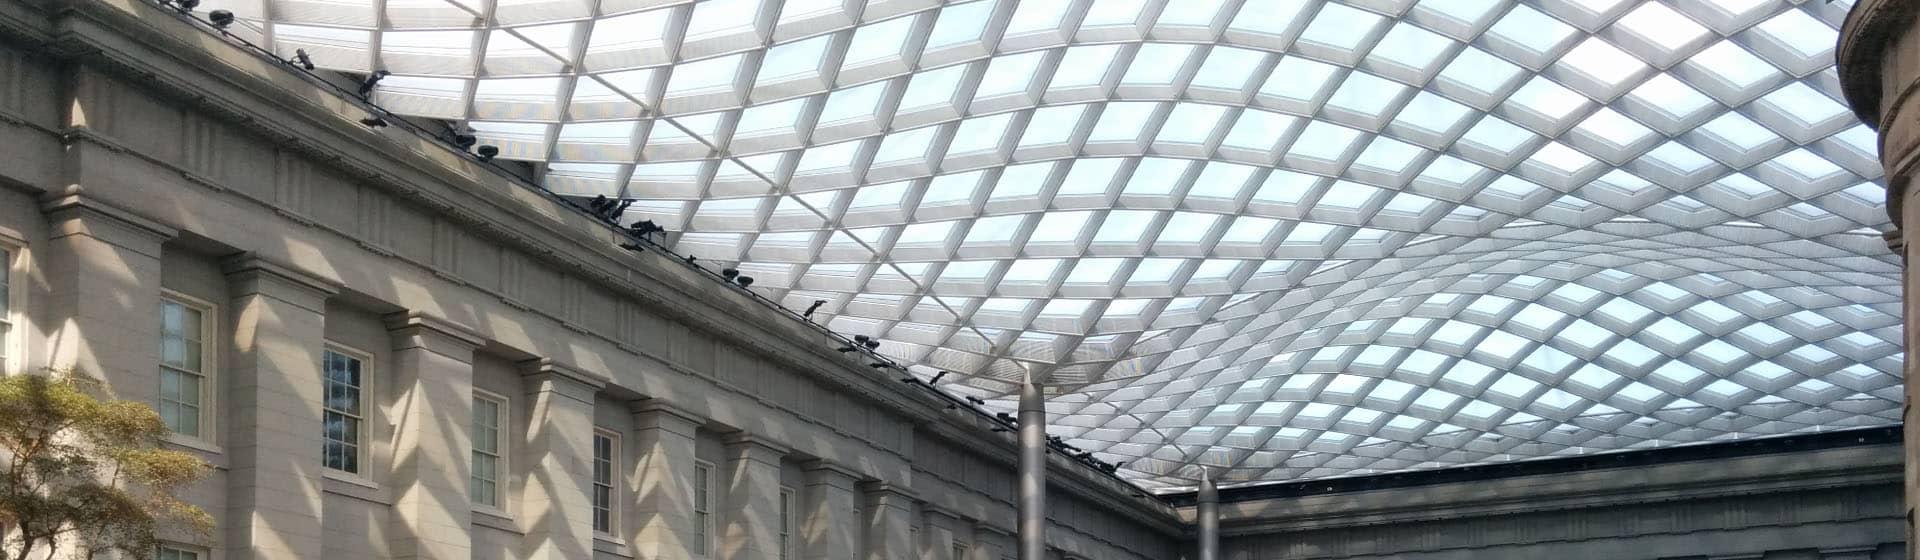 American Art Museum roof